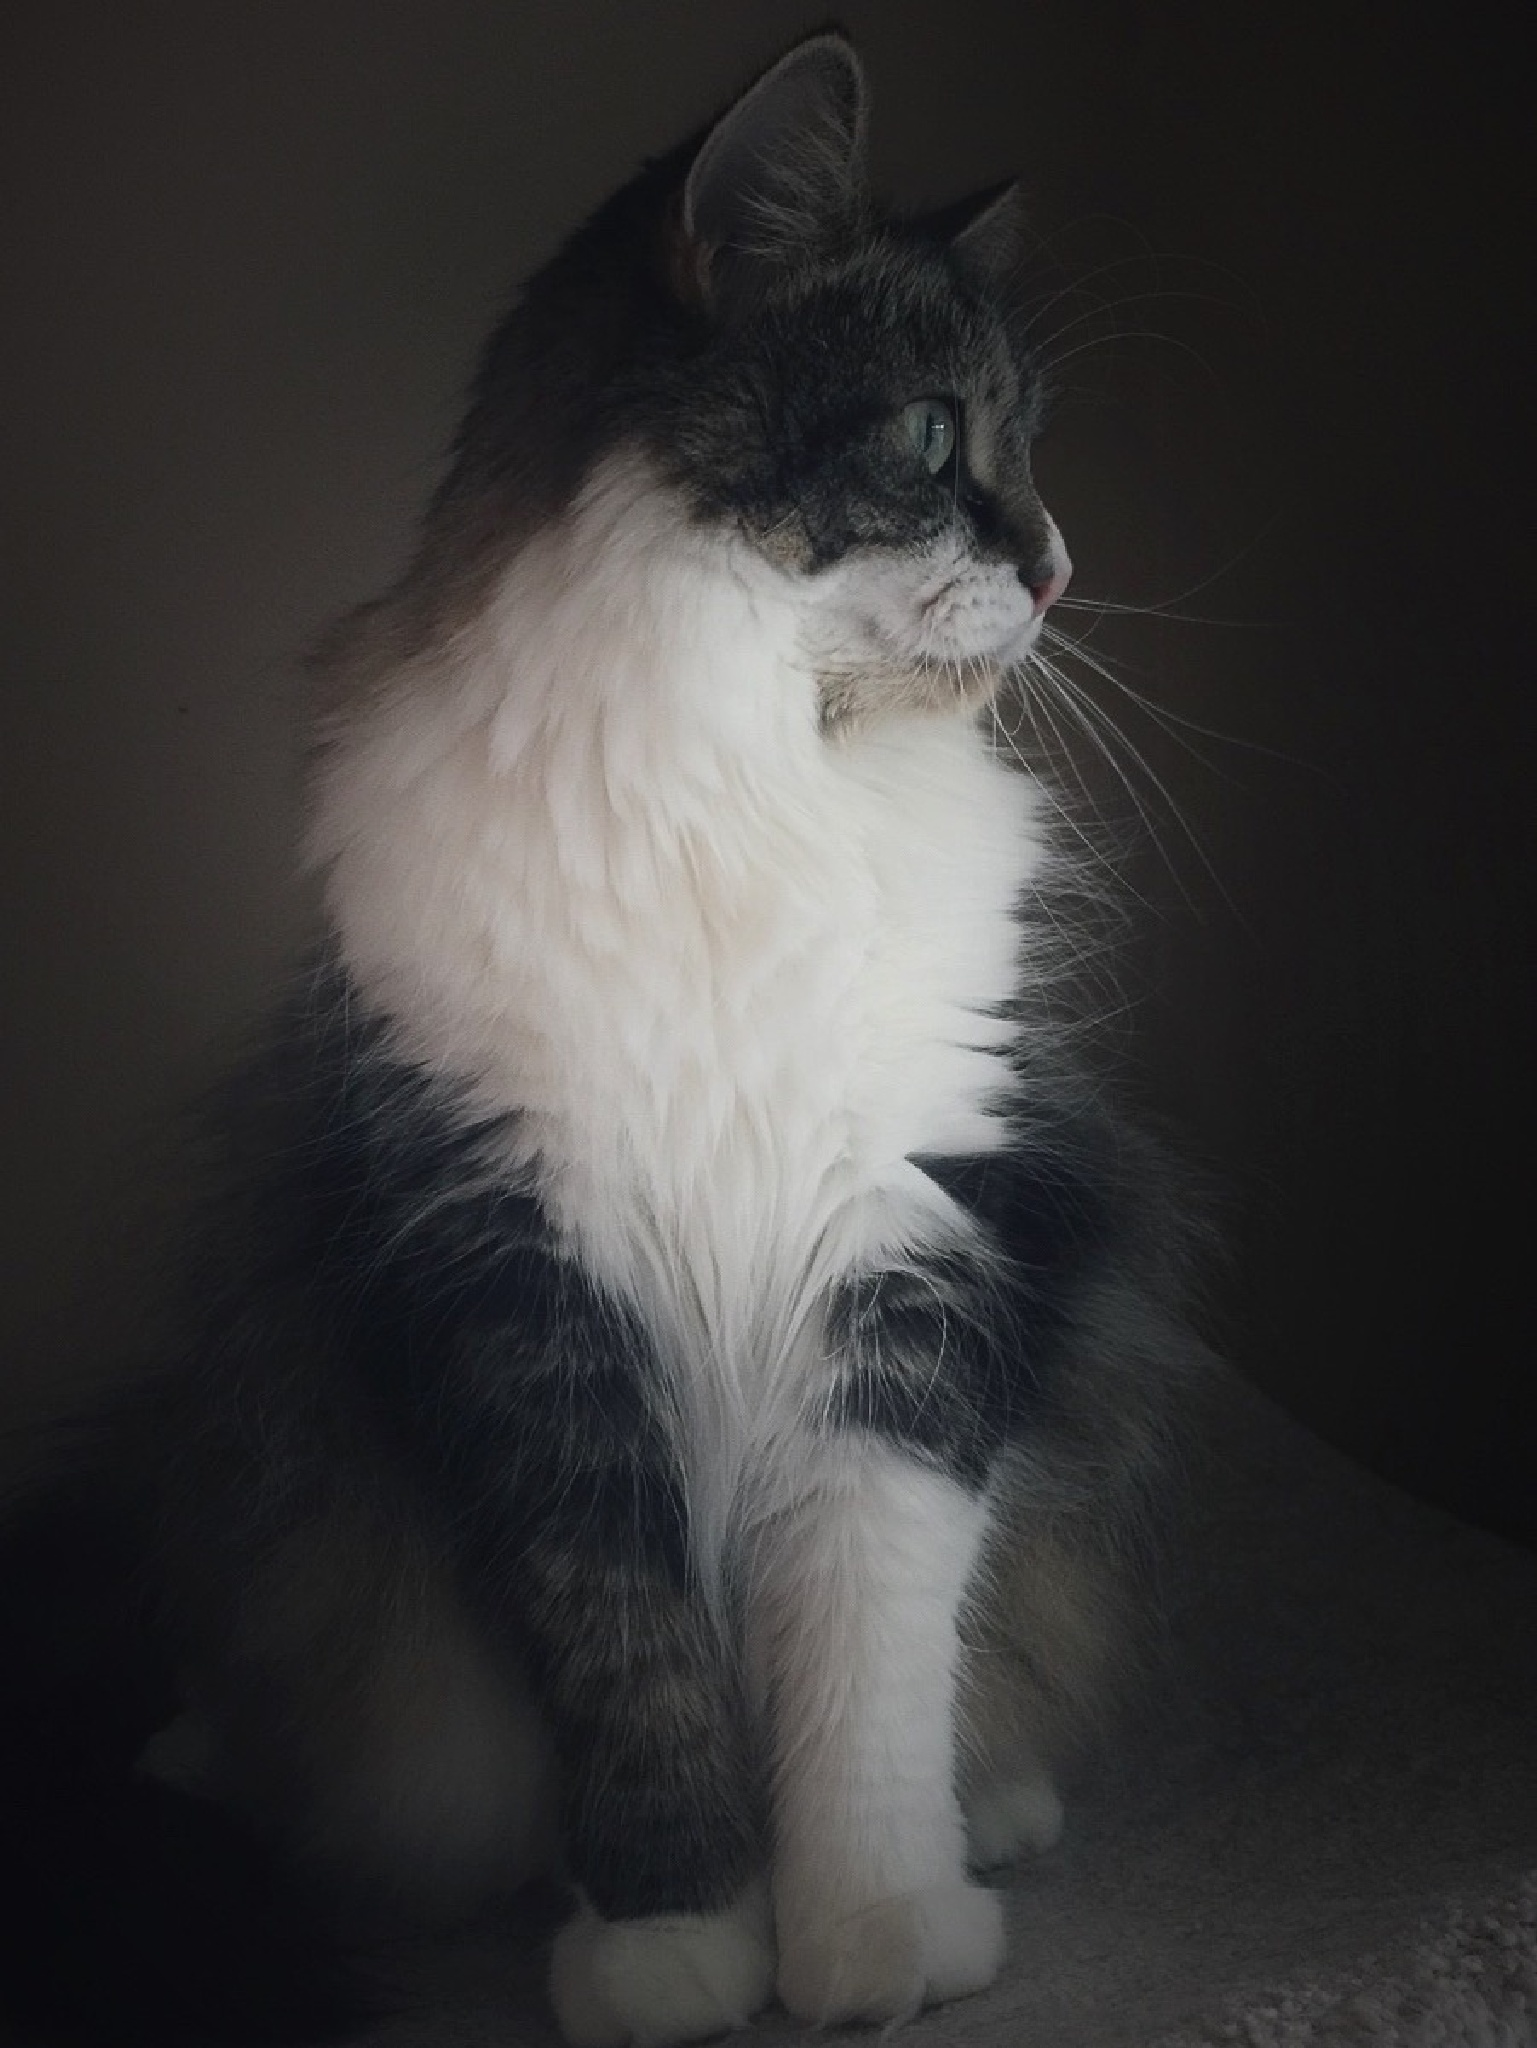 A Dreamy Portrait by Susan Wood